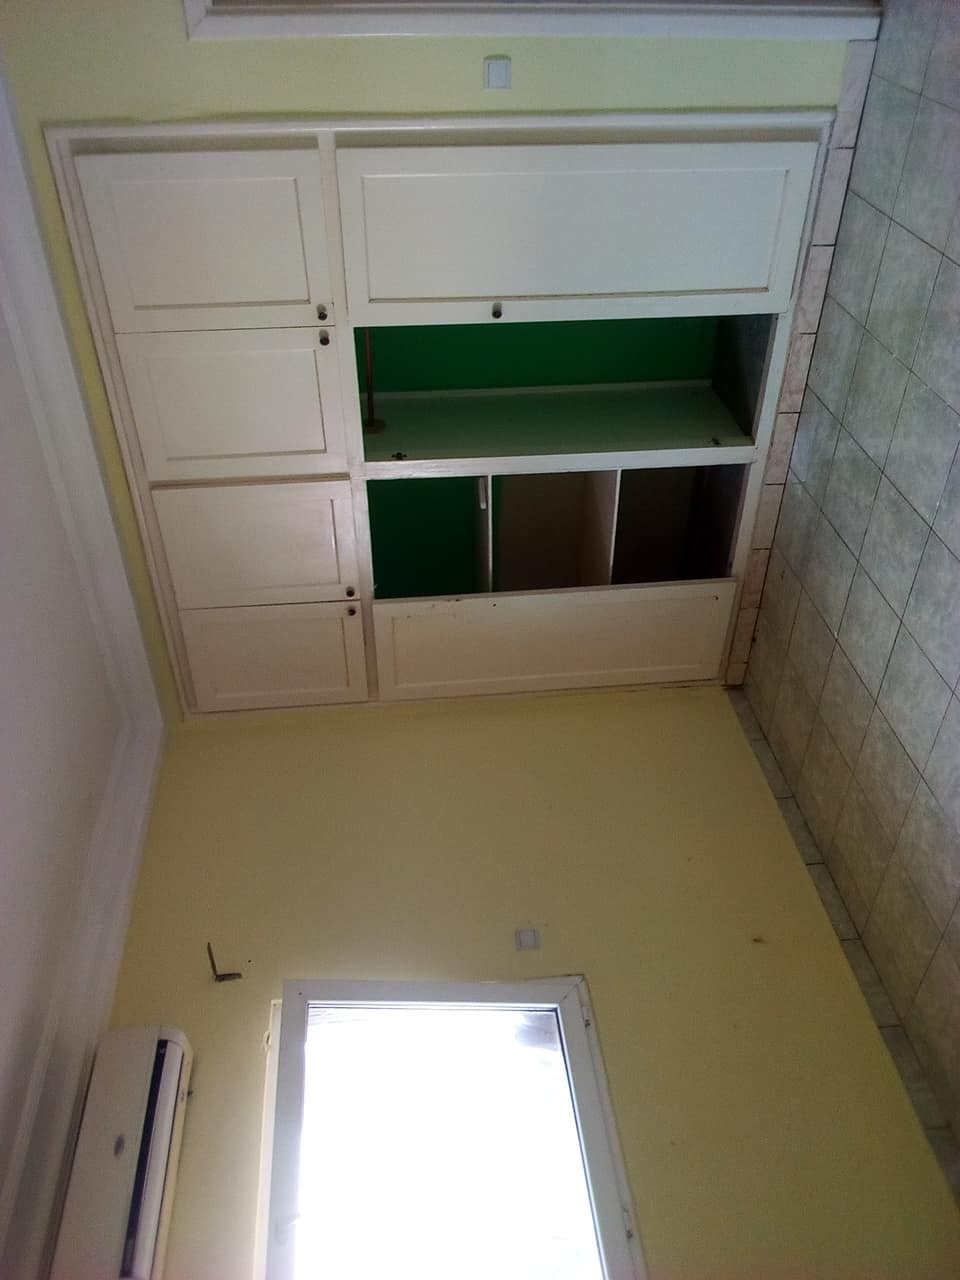 Apartment to rent - Yaoundé, Bastos, pas loin de lambassade de chine - 1 living room(s), 3 bedroom(s), 4 bathroom(s) - 500 000 FCFA / month